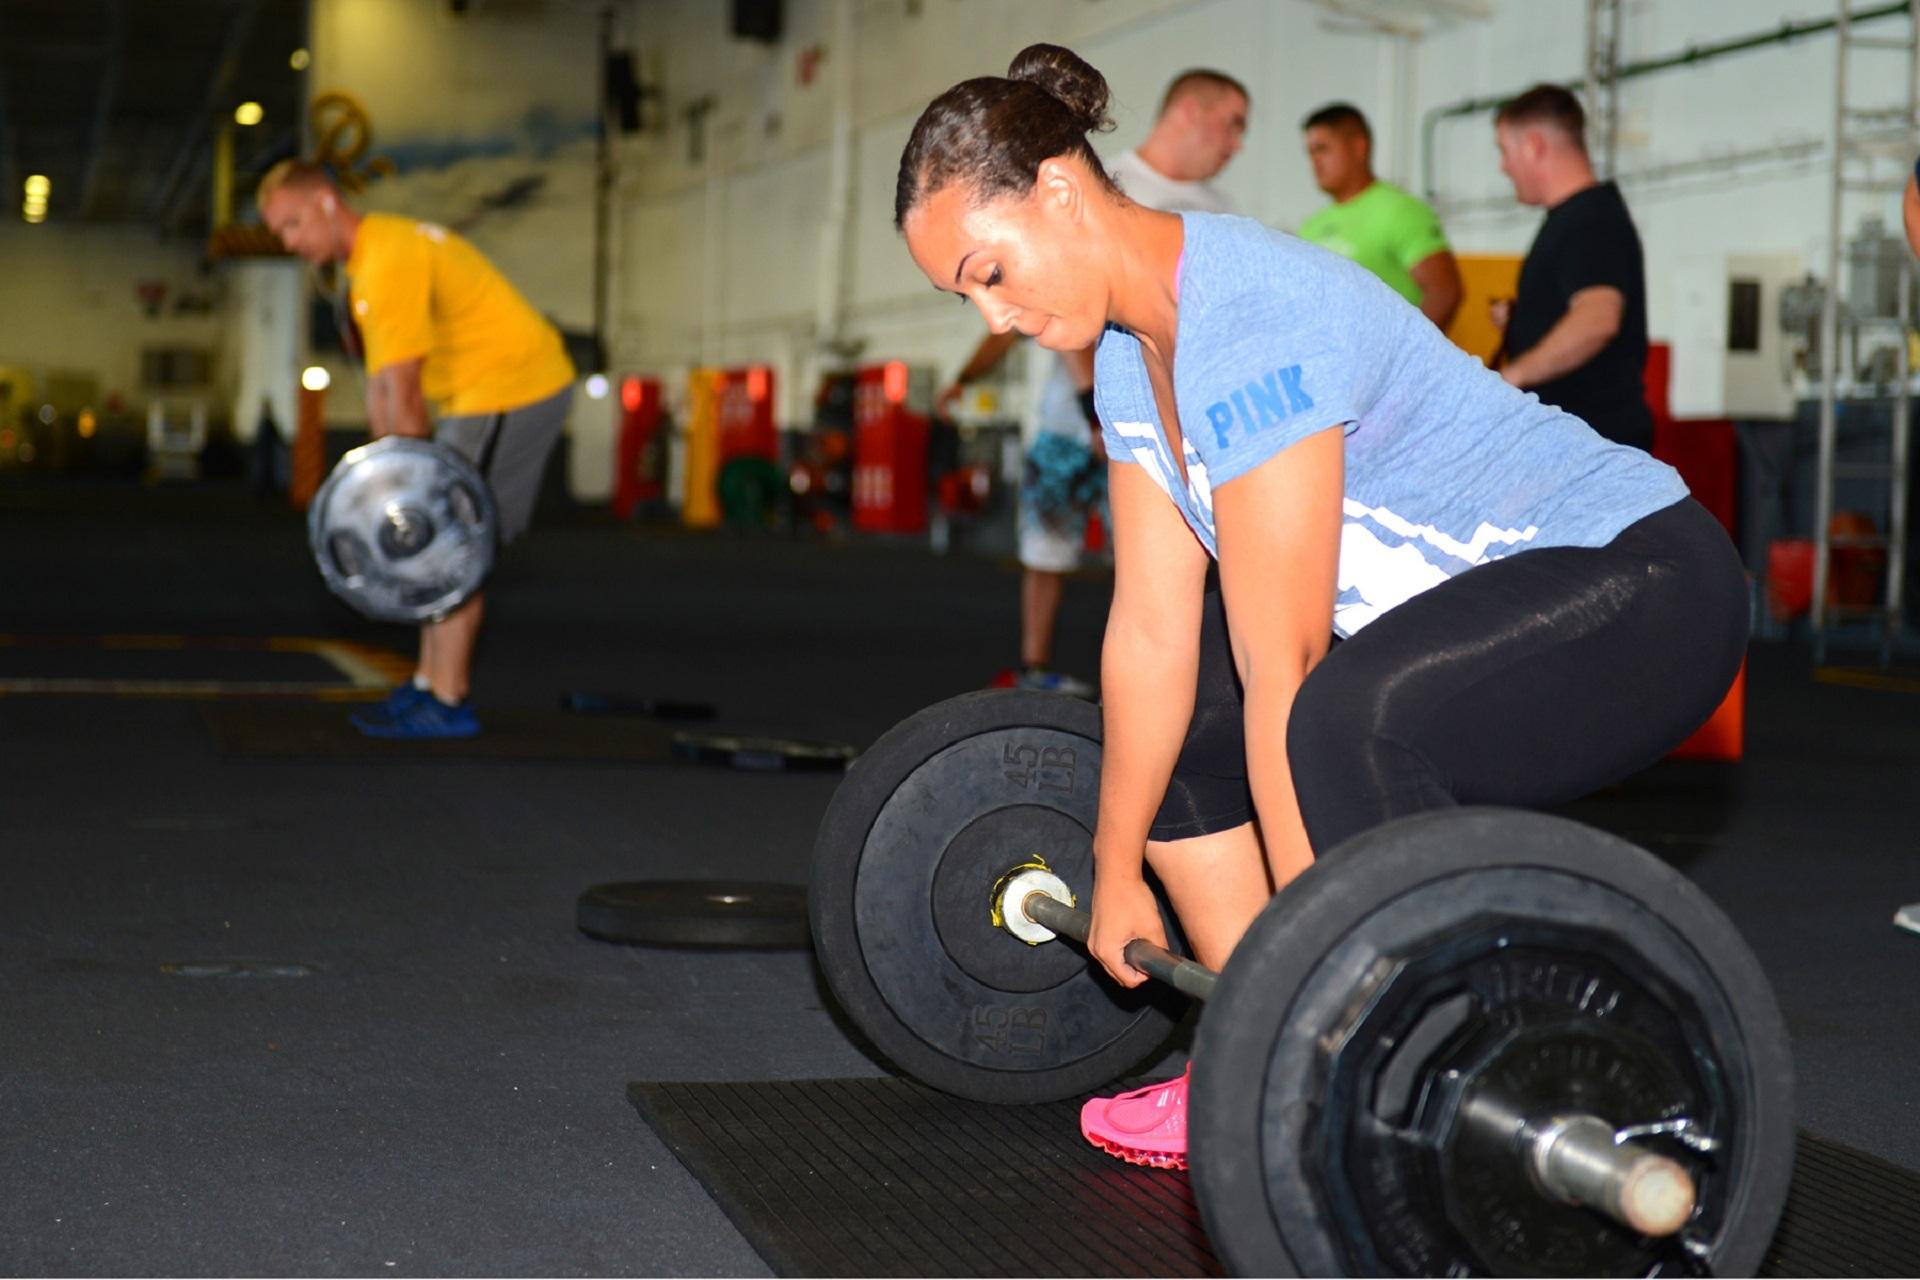 Weight lifting photo